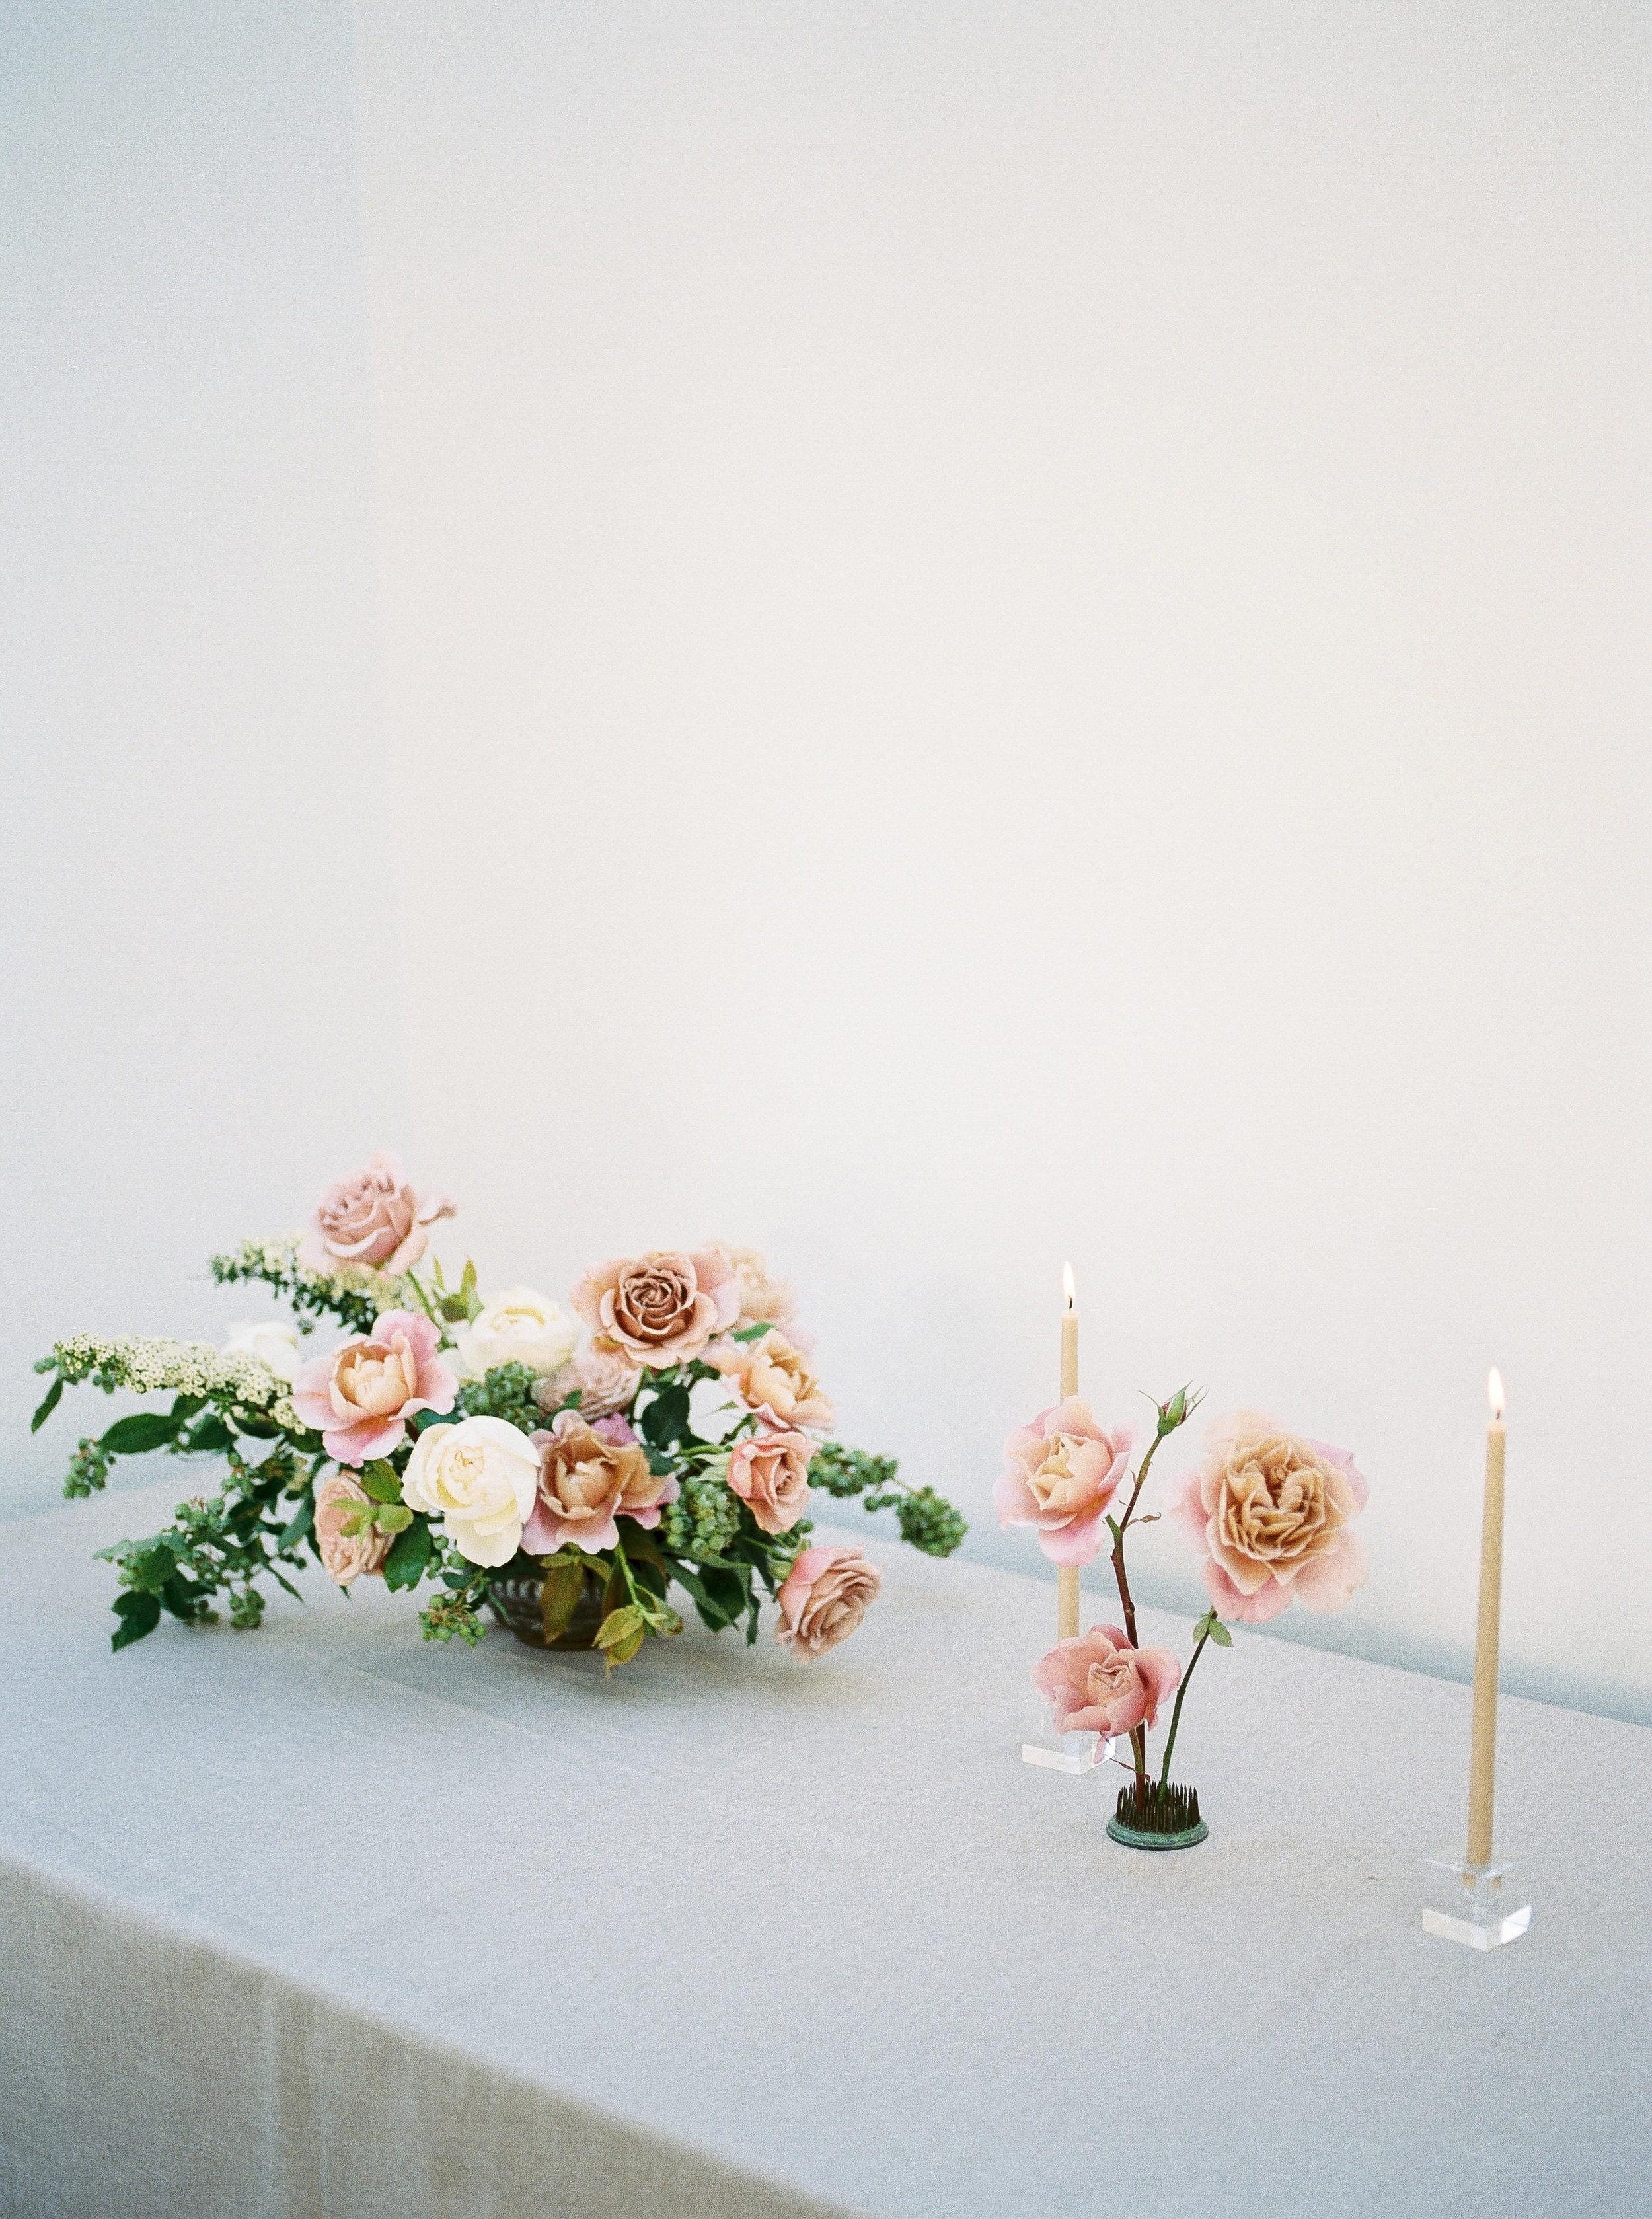 wedding centerpiece with garden roses and spirea.jpg